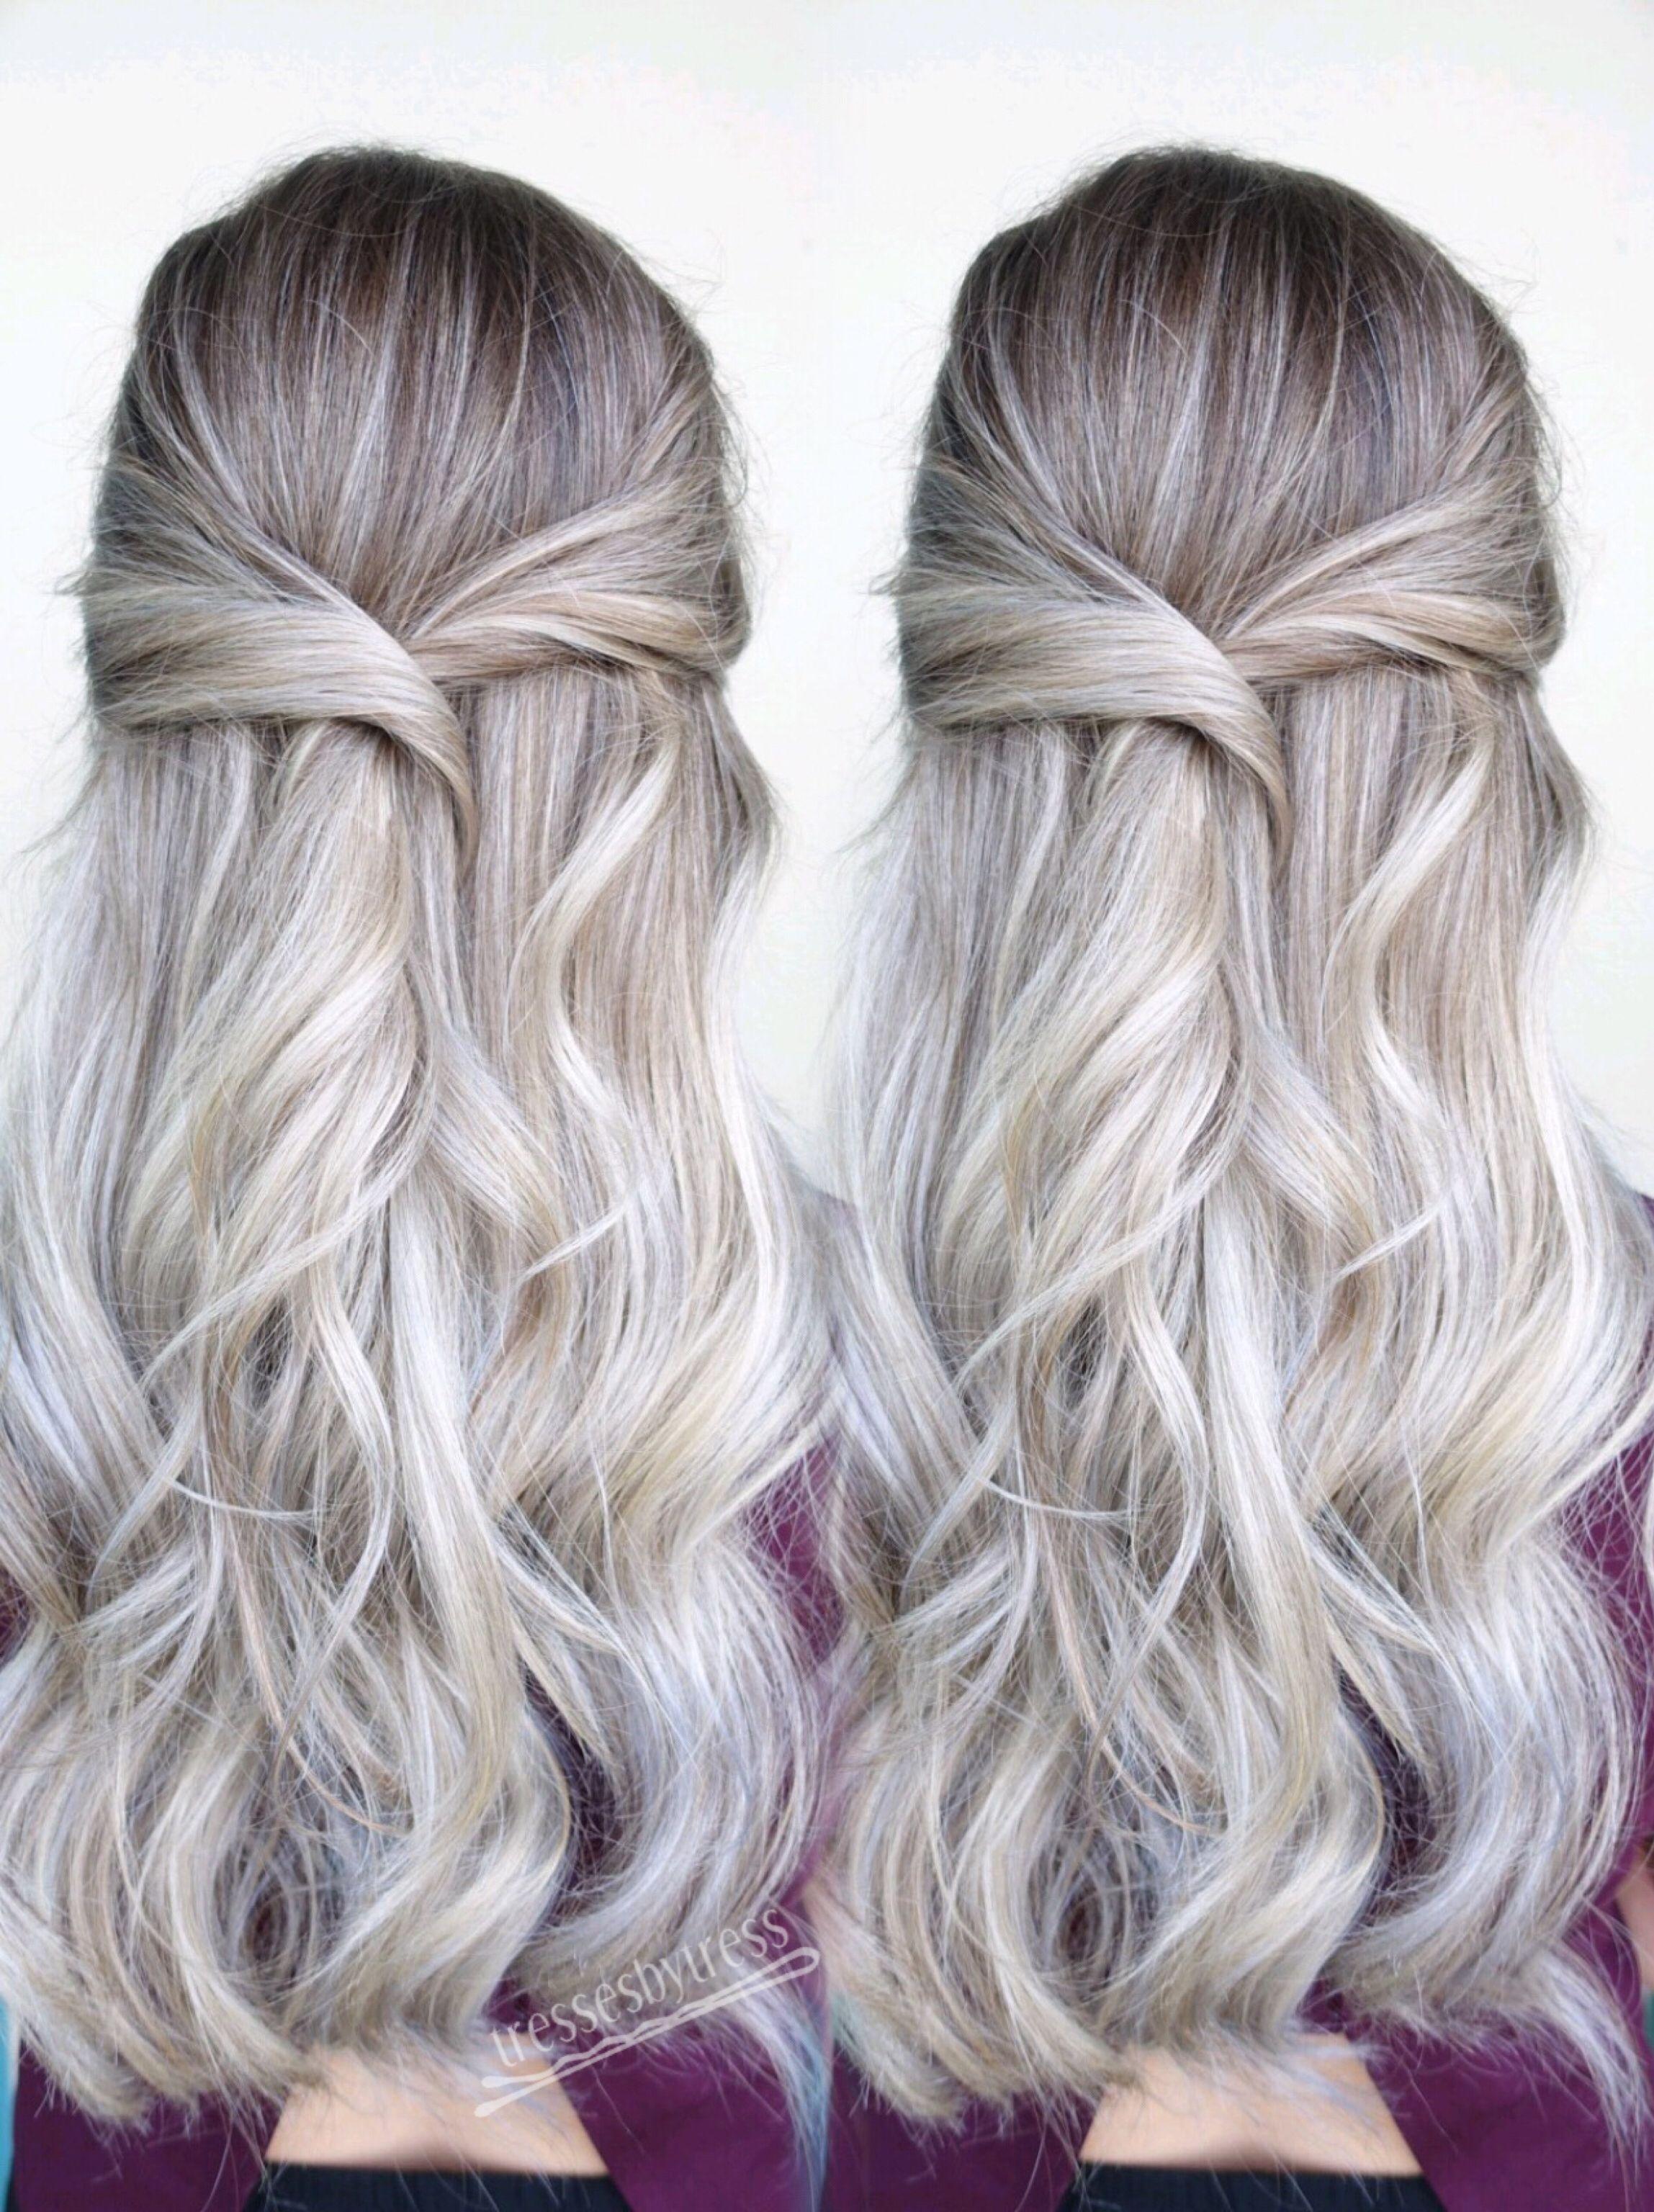 Platinum blonde balayage | Hair and beauty | Pinterest | Blonde ...